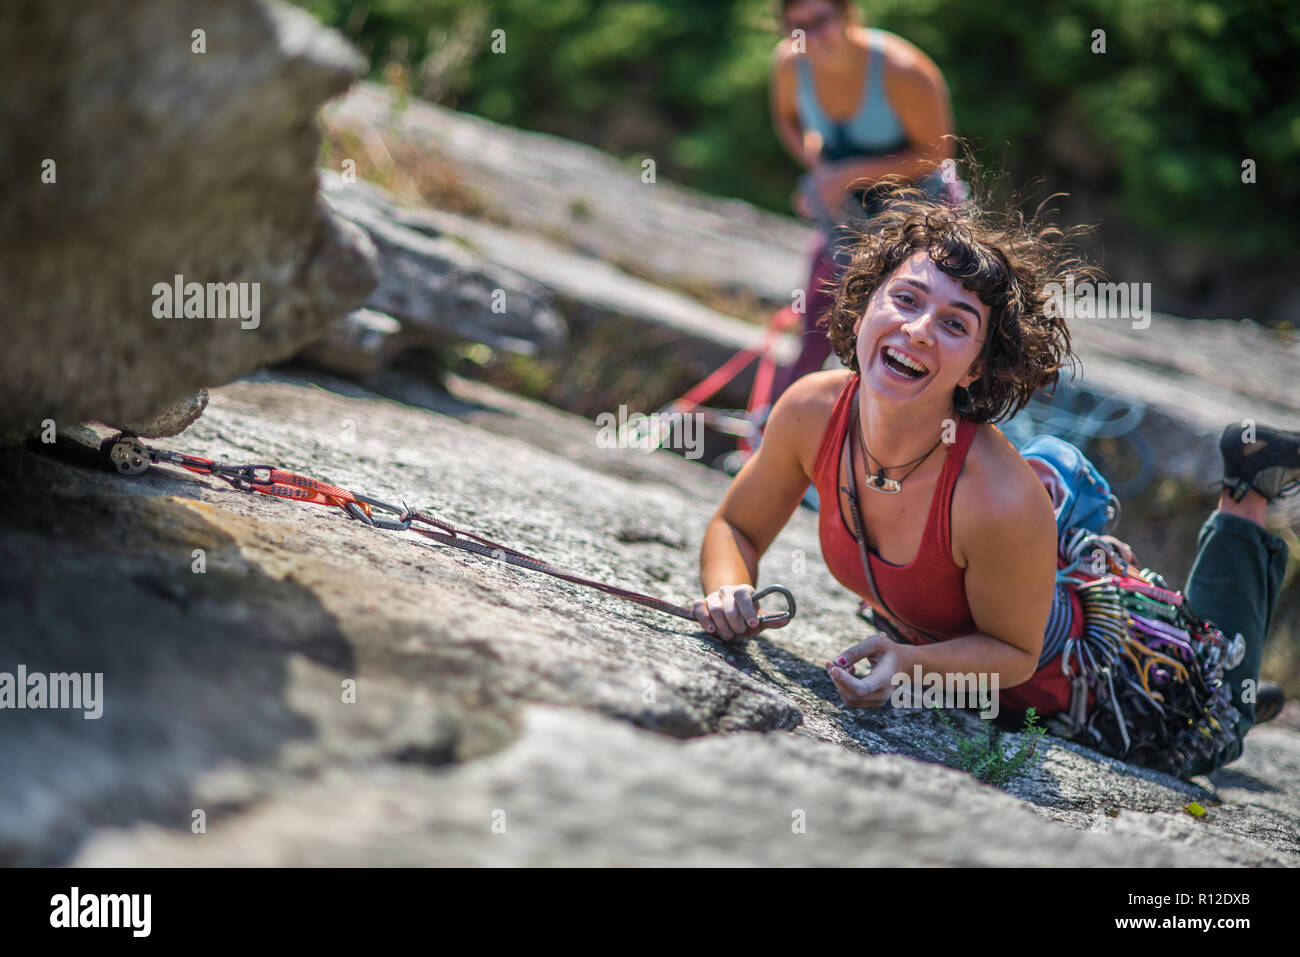 Girlfriends rock climbing, Malamute, Squamish, Canada - Stock Image